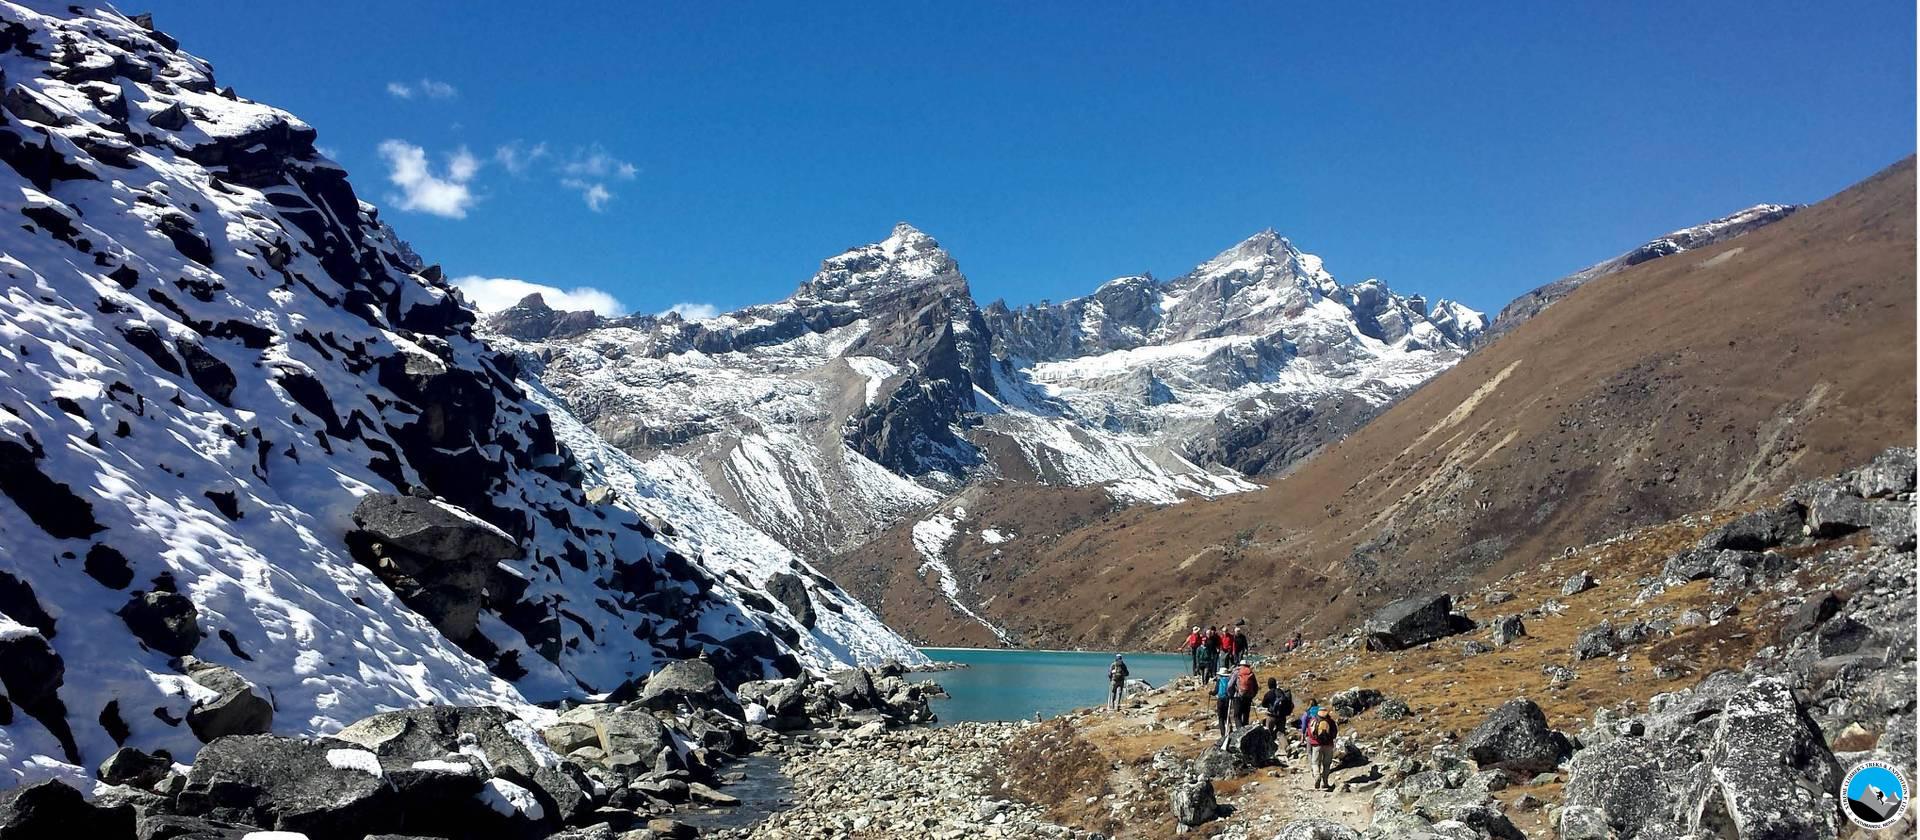 Everest Roilwaling Valley via Tashi Laptsa pass